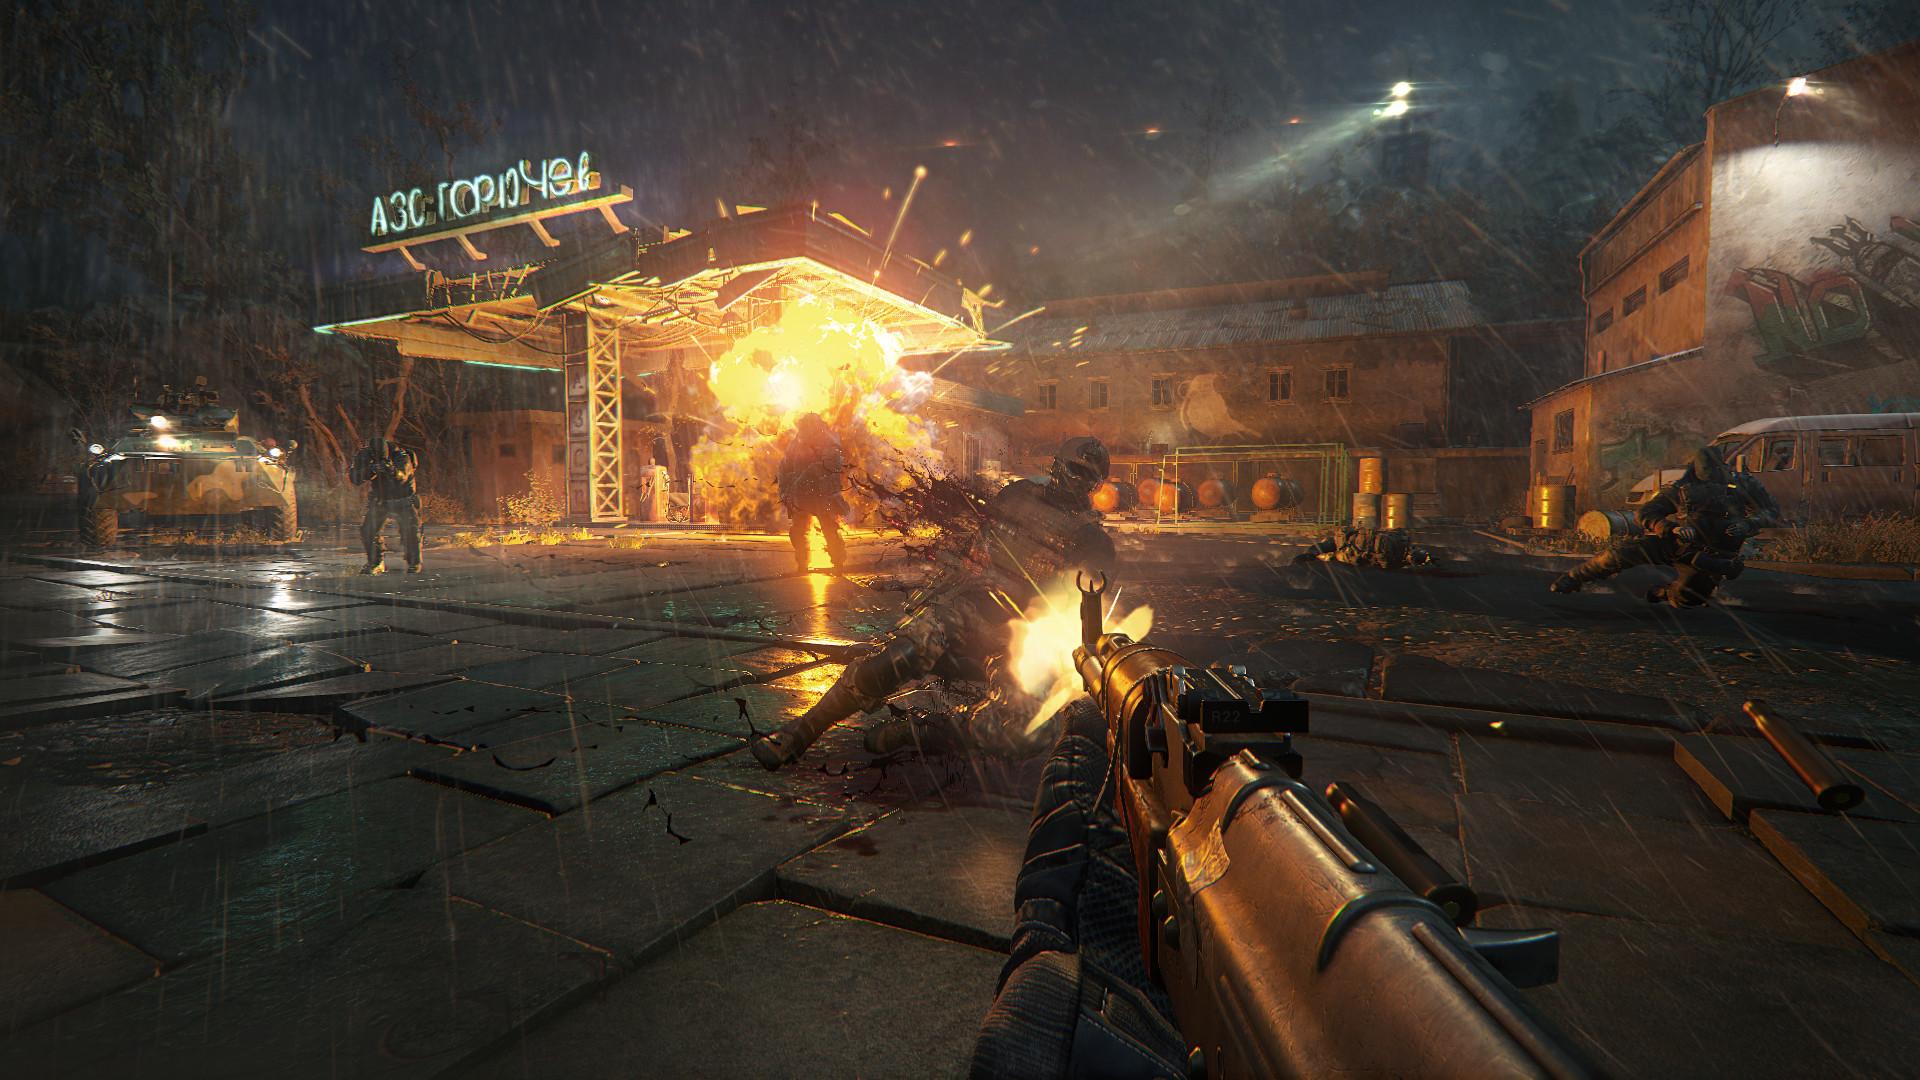 free download sniper ghost warrior 3 season pass edition-baldman crack fix hot pc